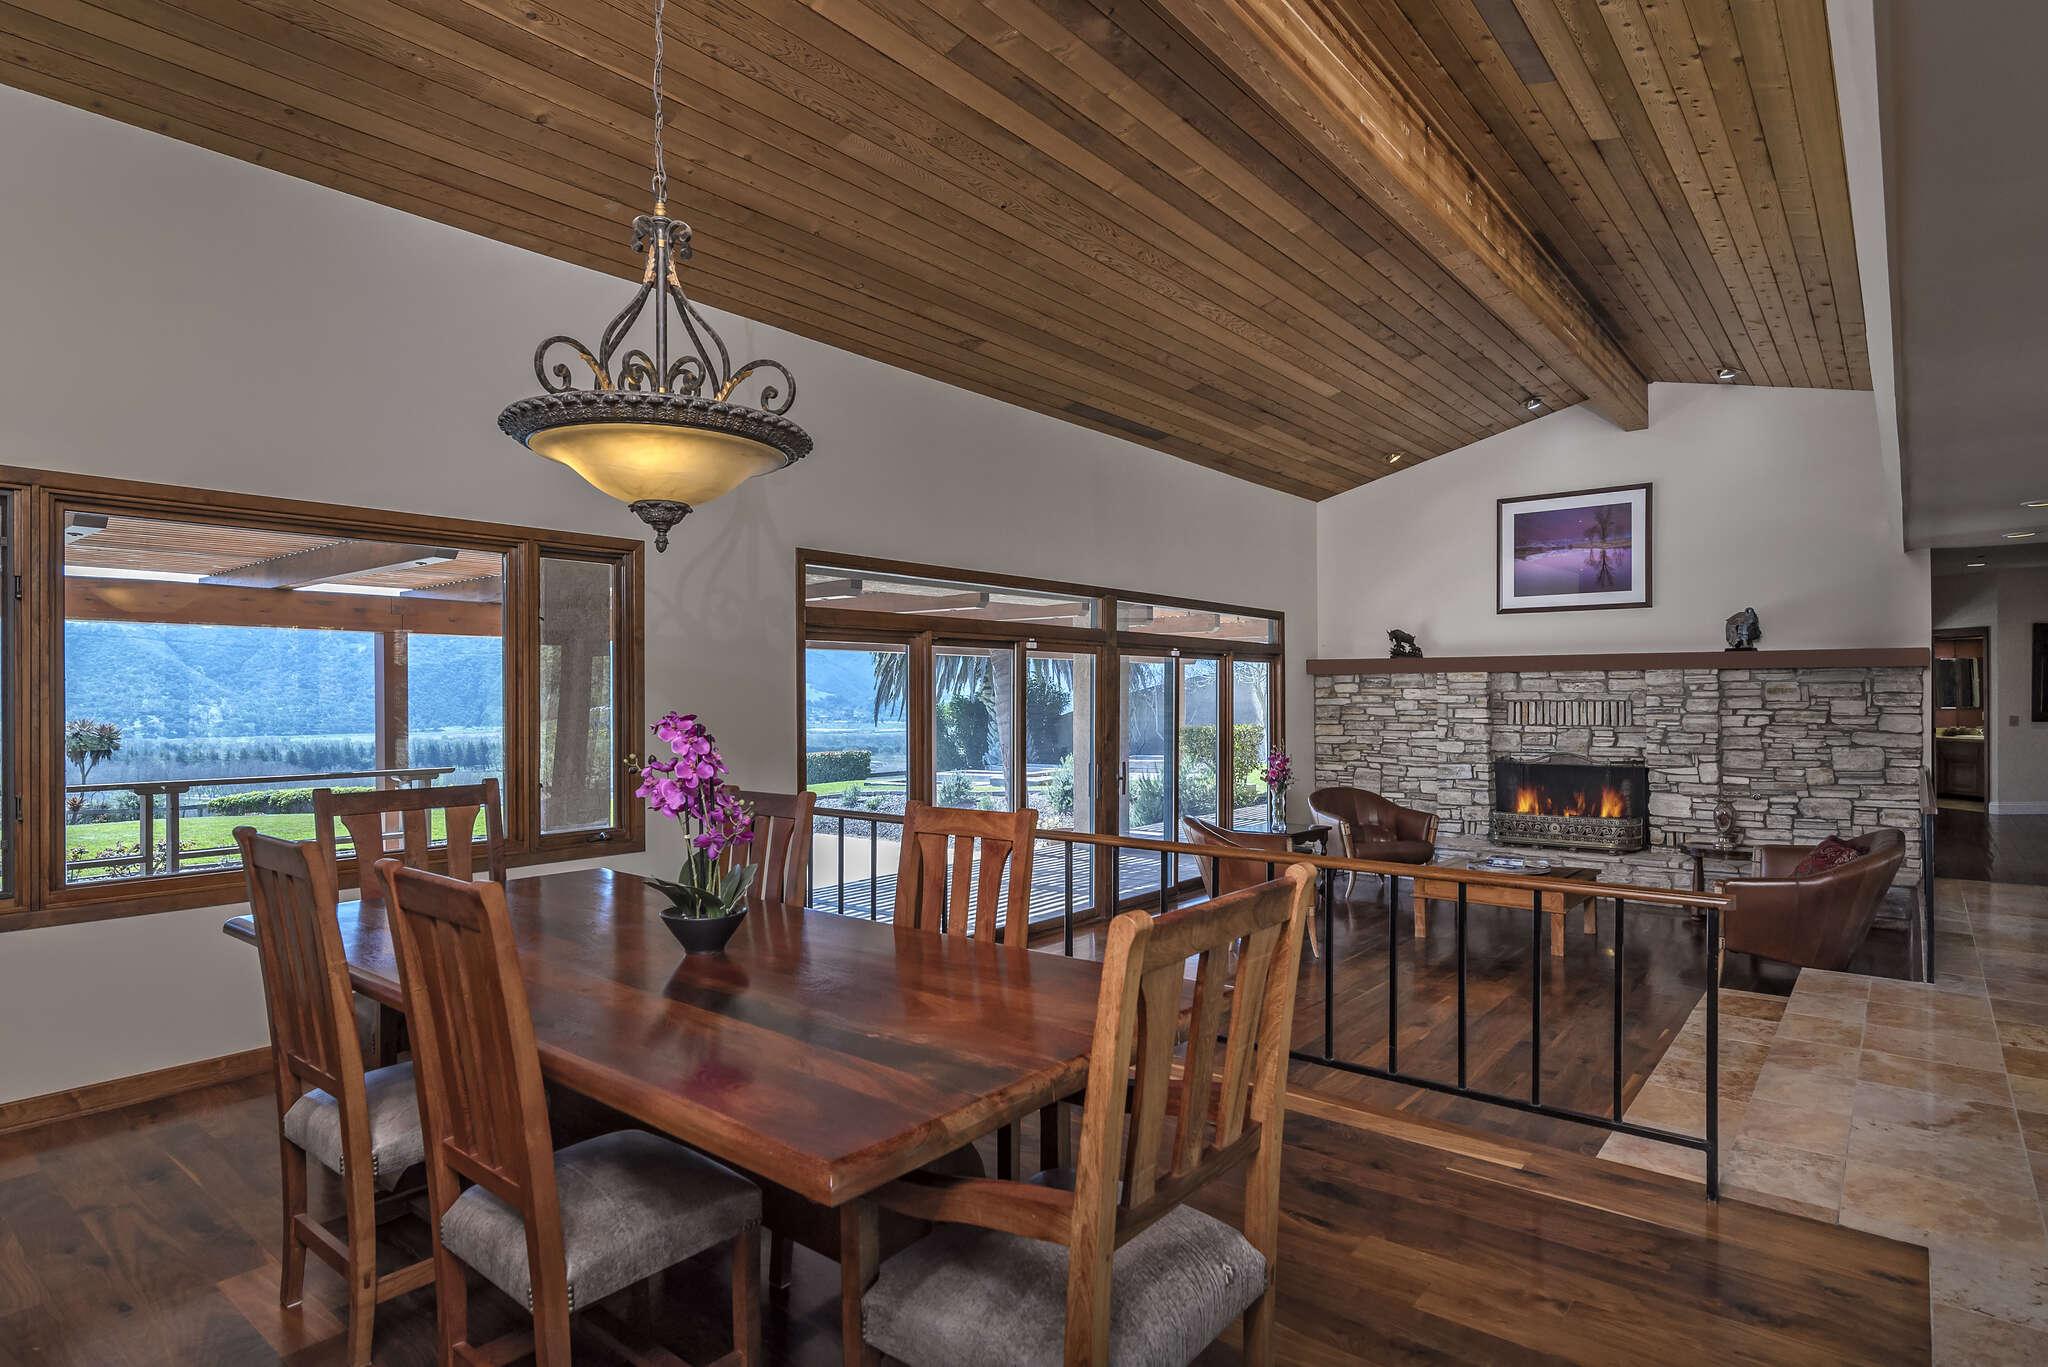 Single Family for Sale at 832 Ballard Canyon Rd Solvang, California 93463 United States